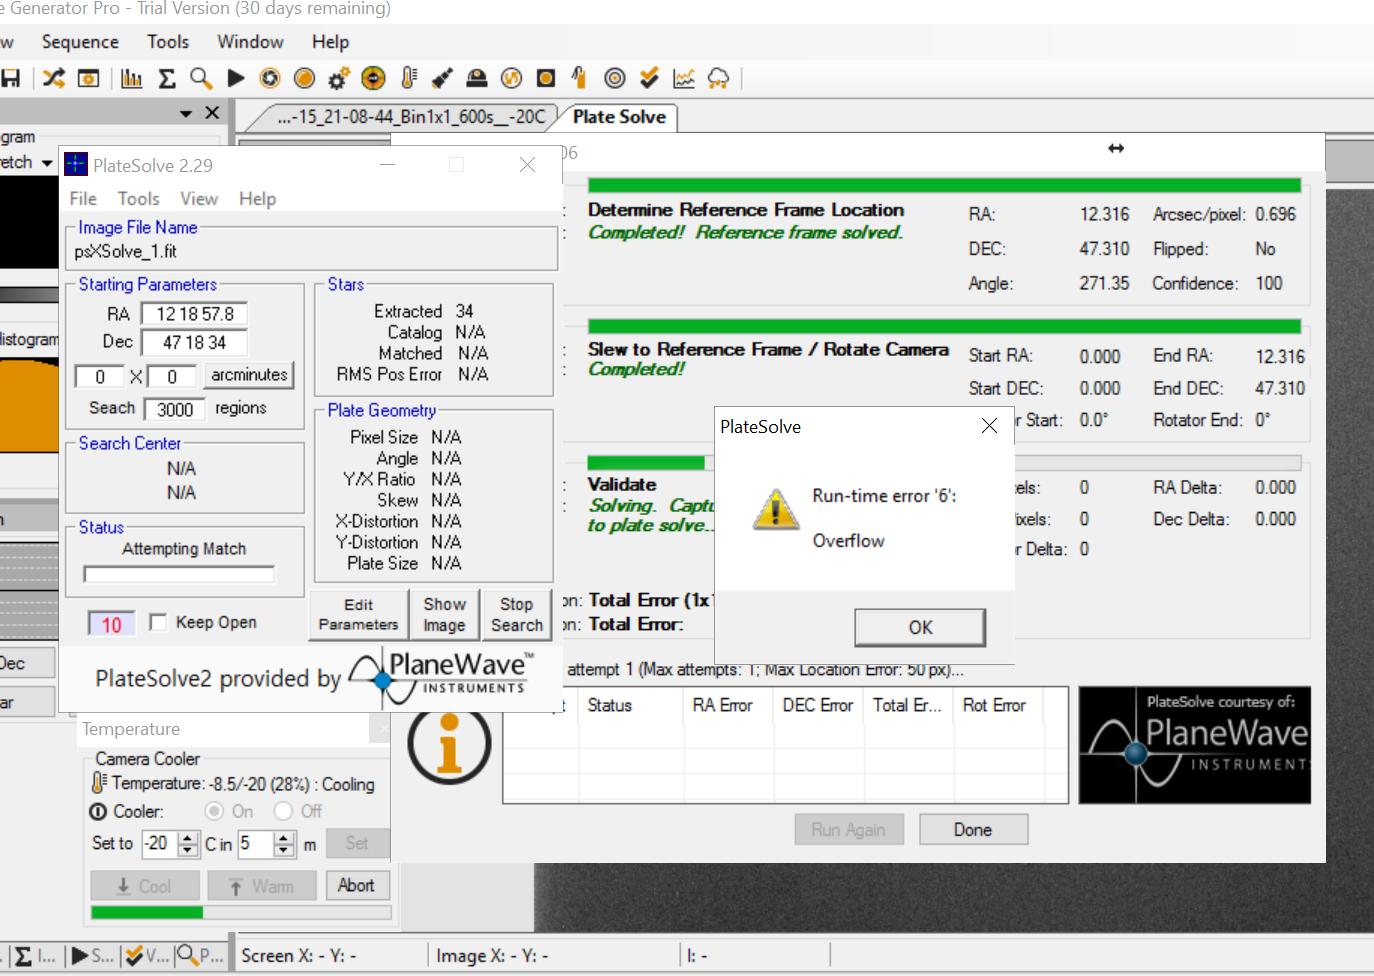 PlateSolve2 gives an error